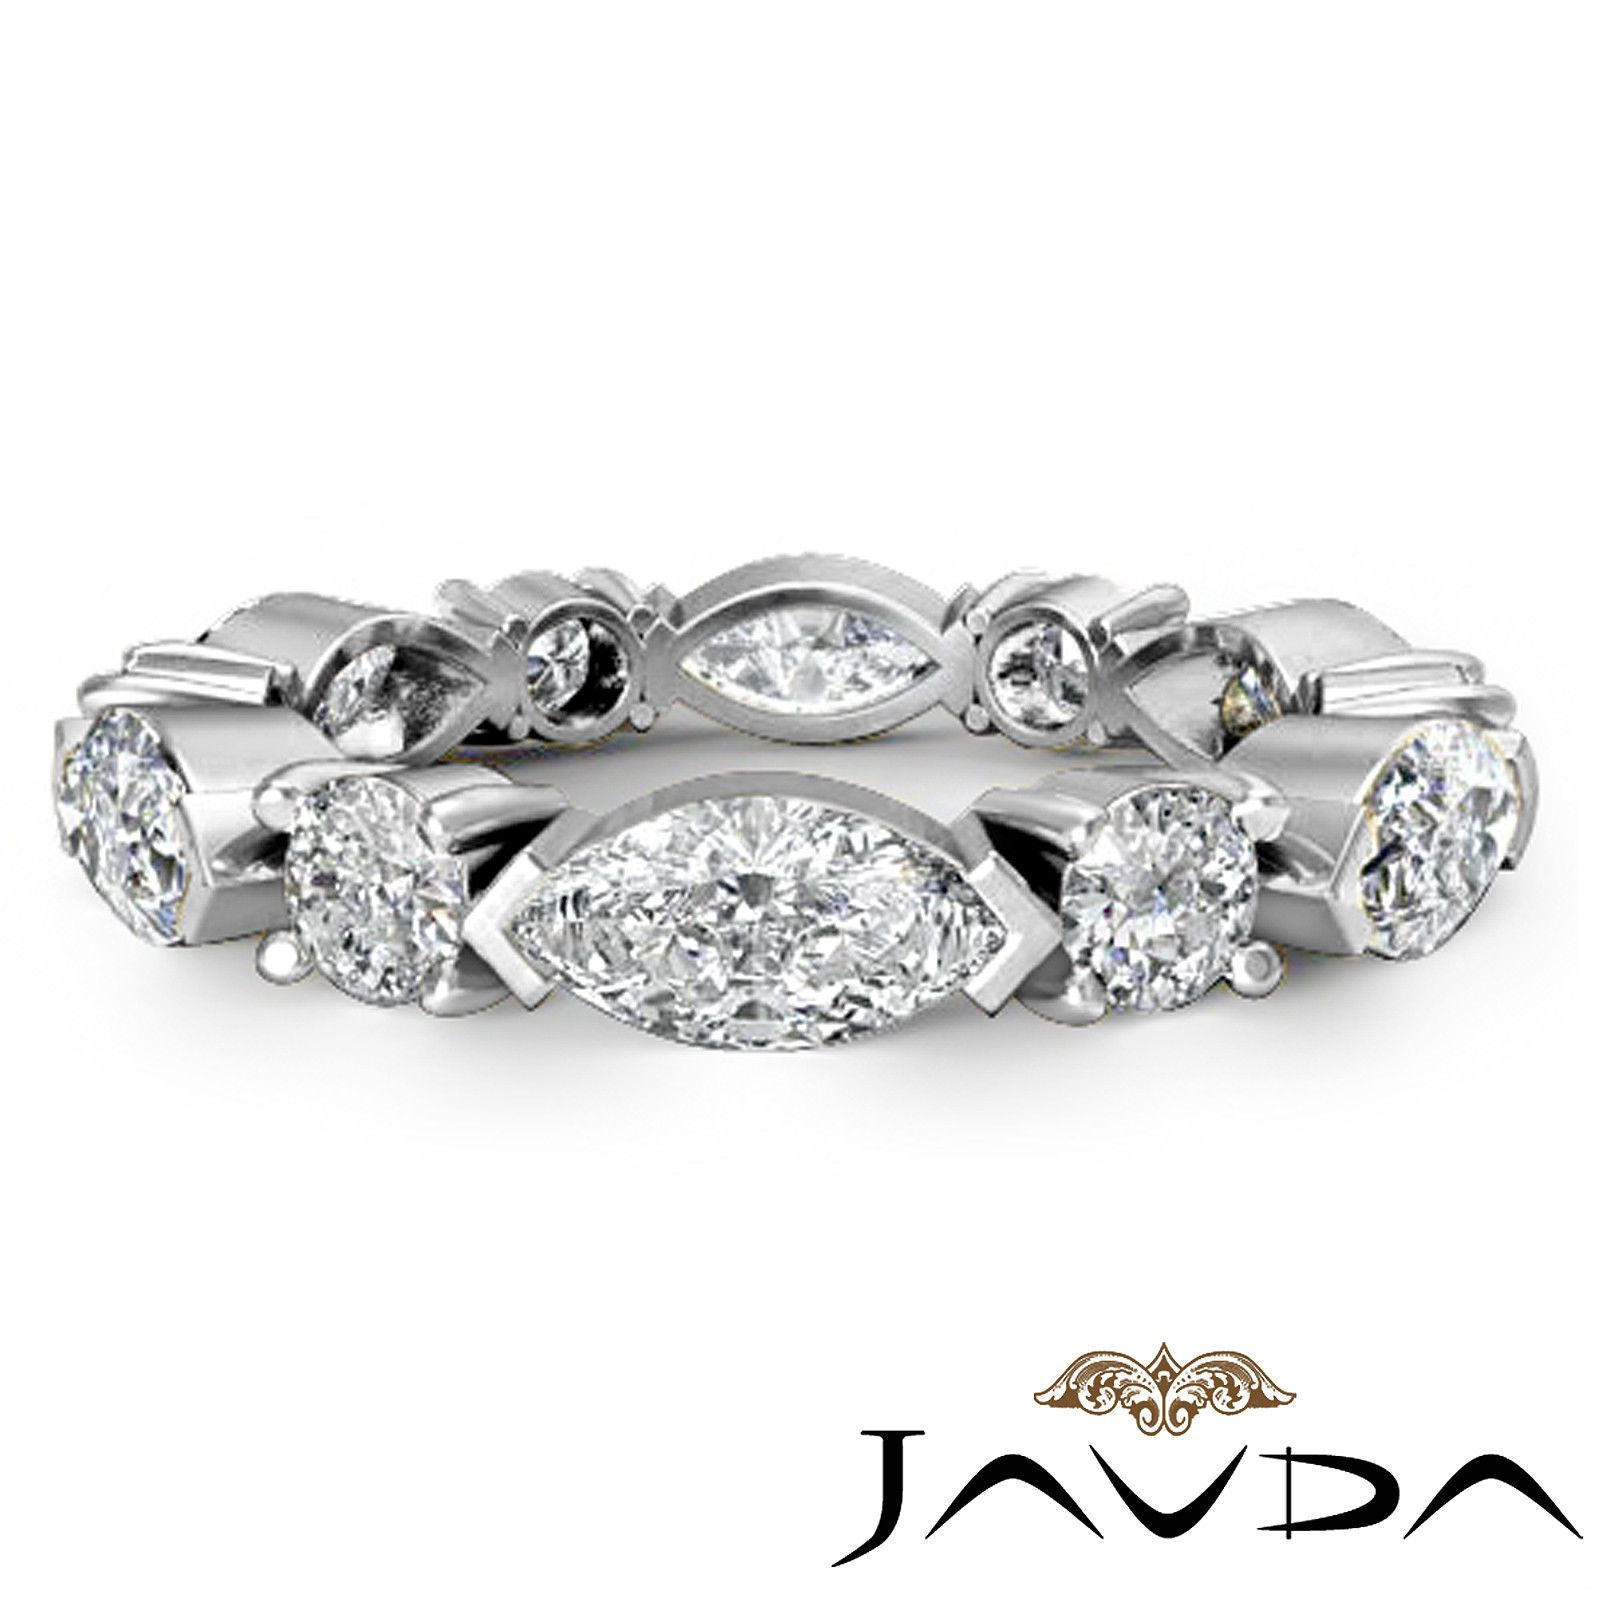 wedding rings ebay Women Classic Eternity Wedding Band Marquise Round Diamond Ring Platinum 1 62ct eBay